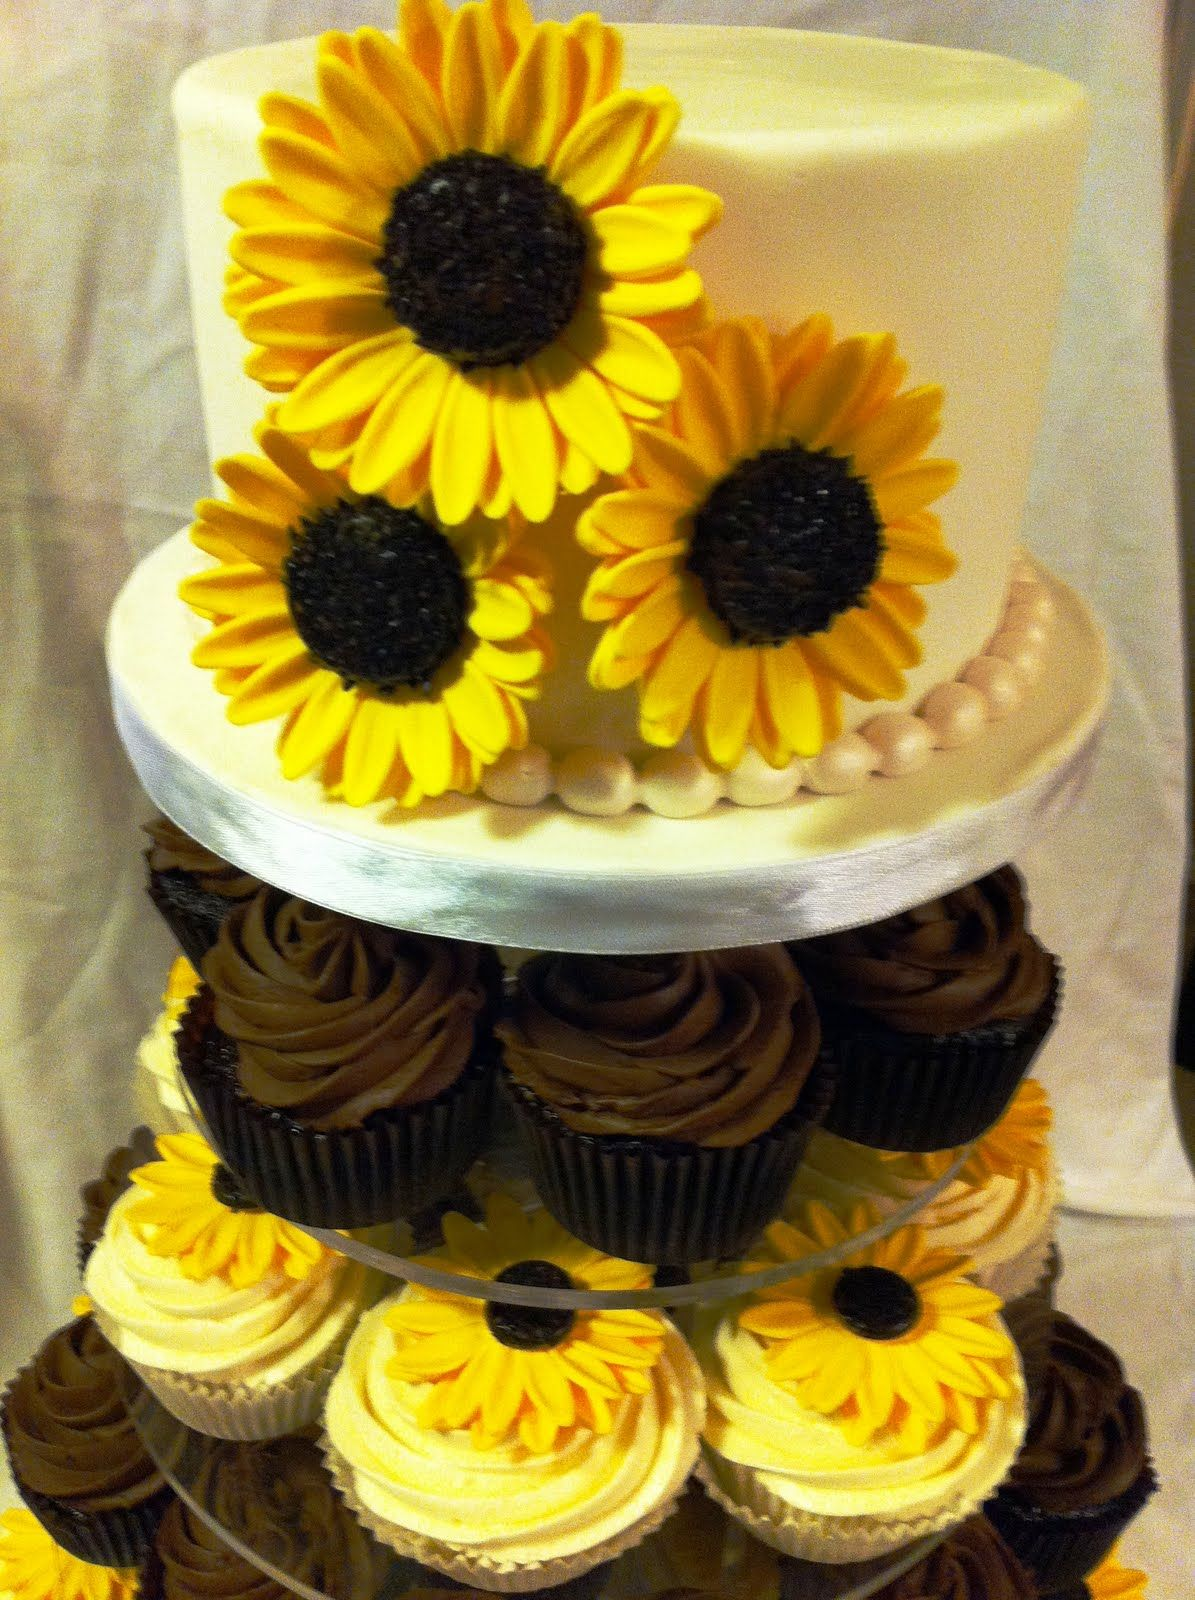 Wedding Cake Ideas With Sunflowers - Sunflower wedding decorating ideas